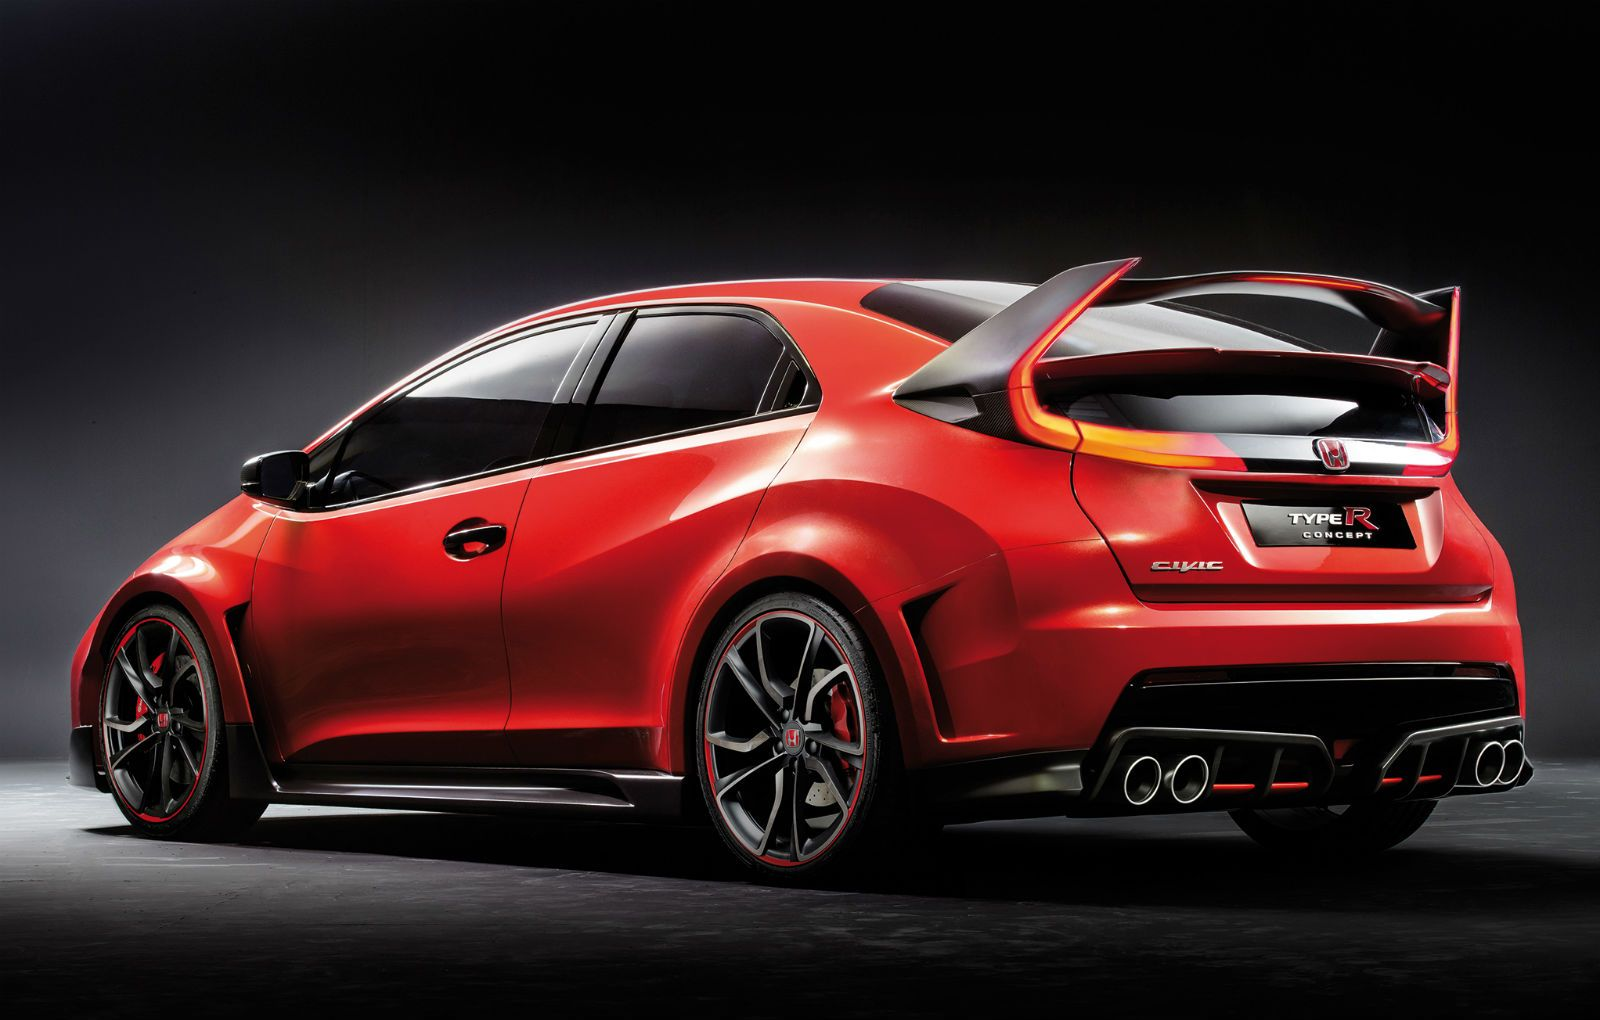 Image for 2014 Honda Civic TypeR Hatchback Wallpaper